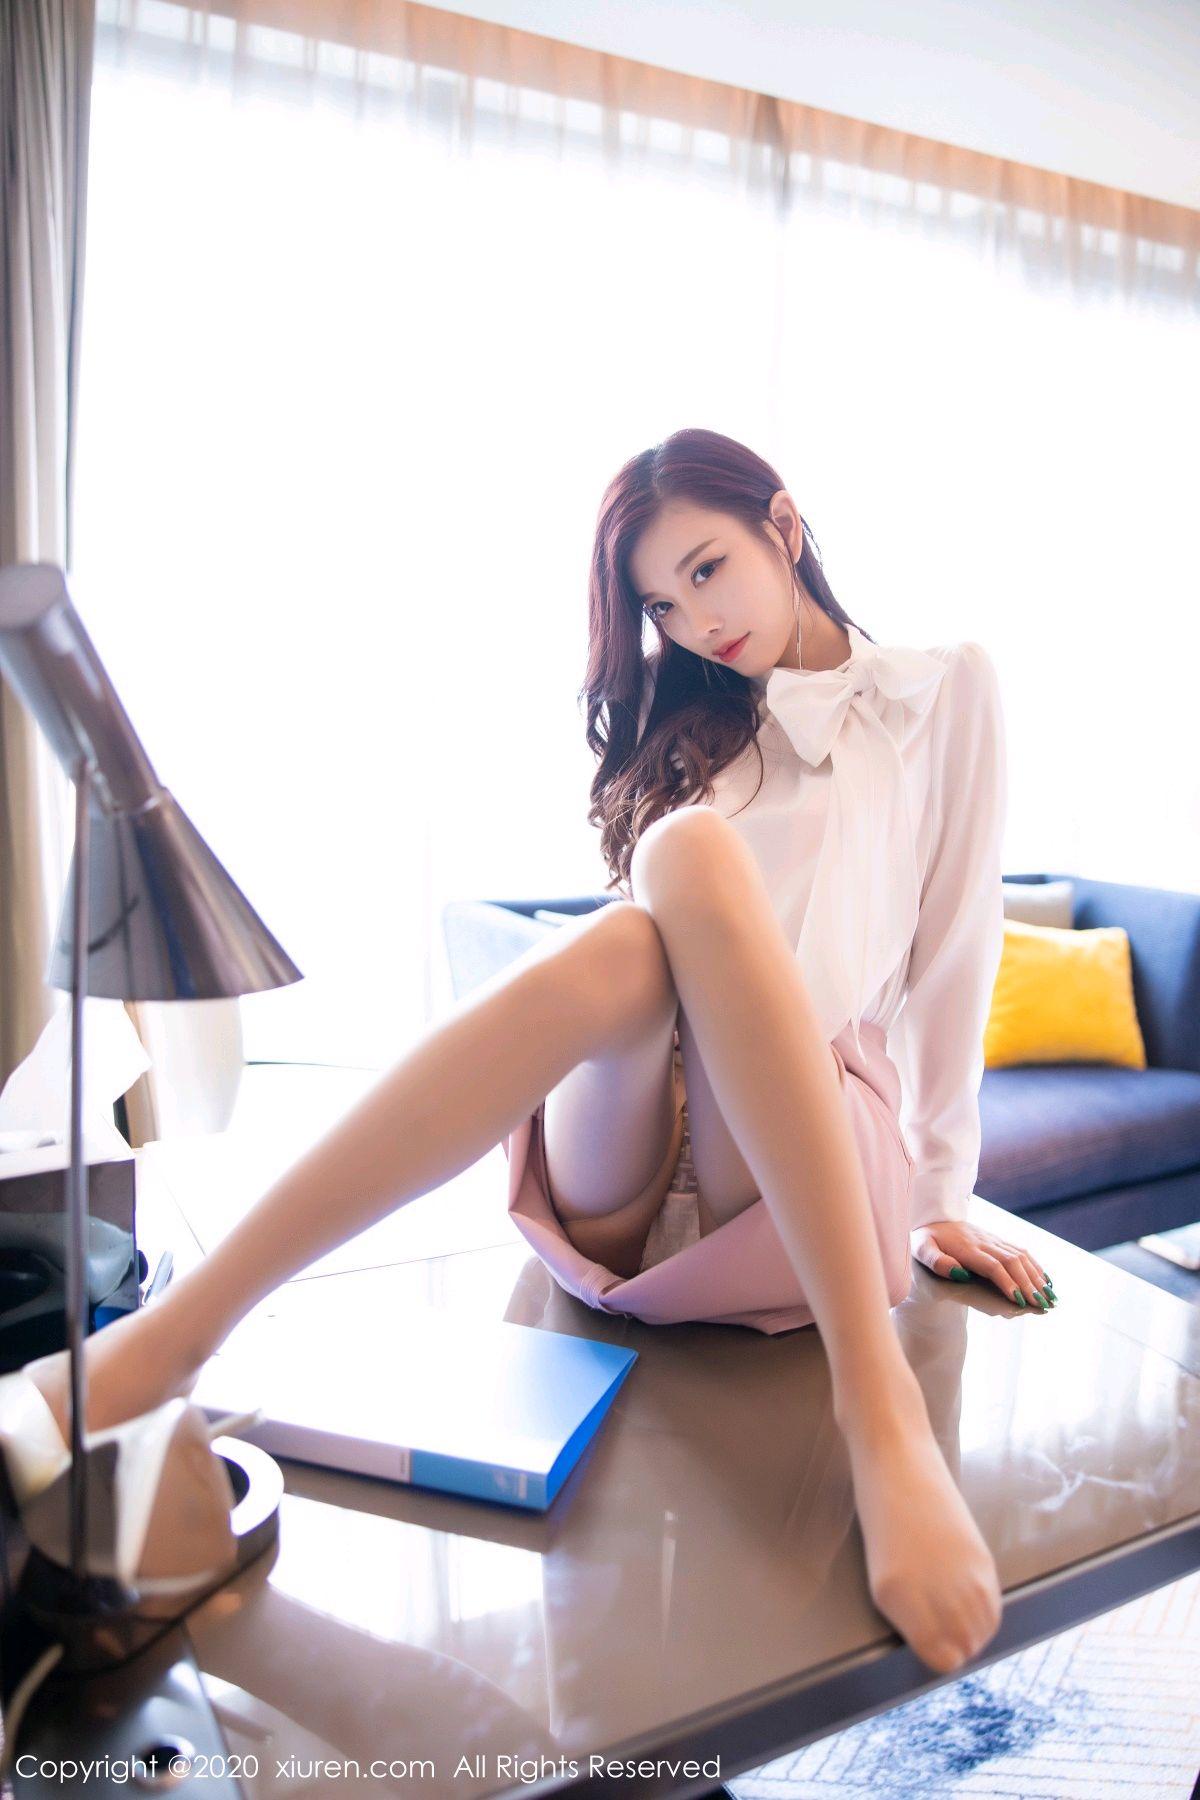 [XiuRen] Vol.2431 Yang Chen Chen 39P, Tall, Underwear, Uniform, Xiuren, Yang Chen Chen